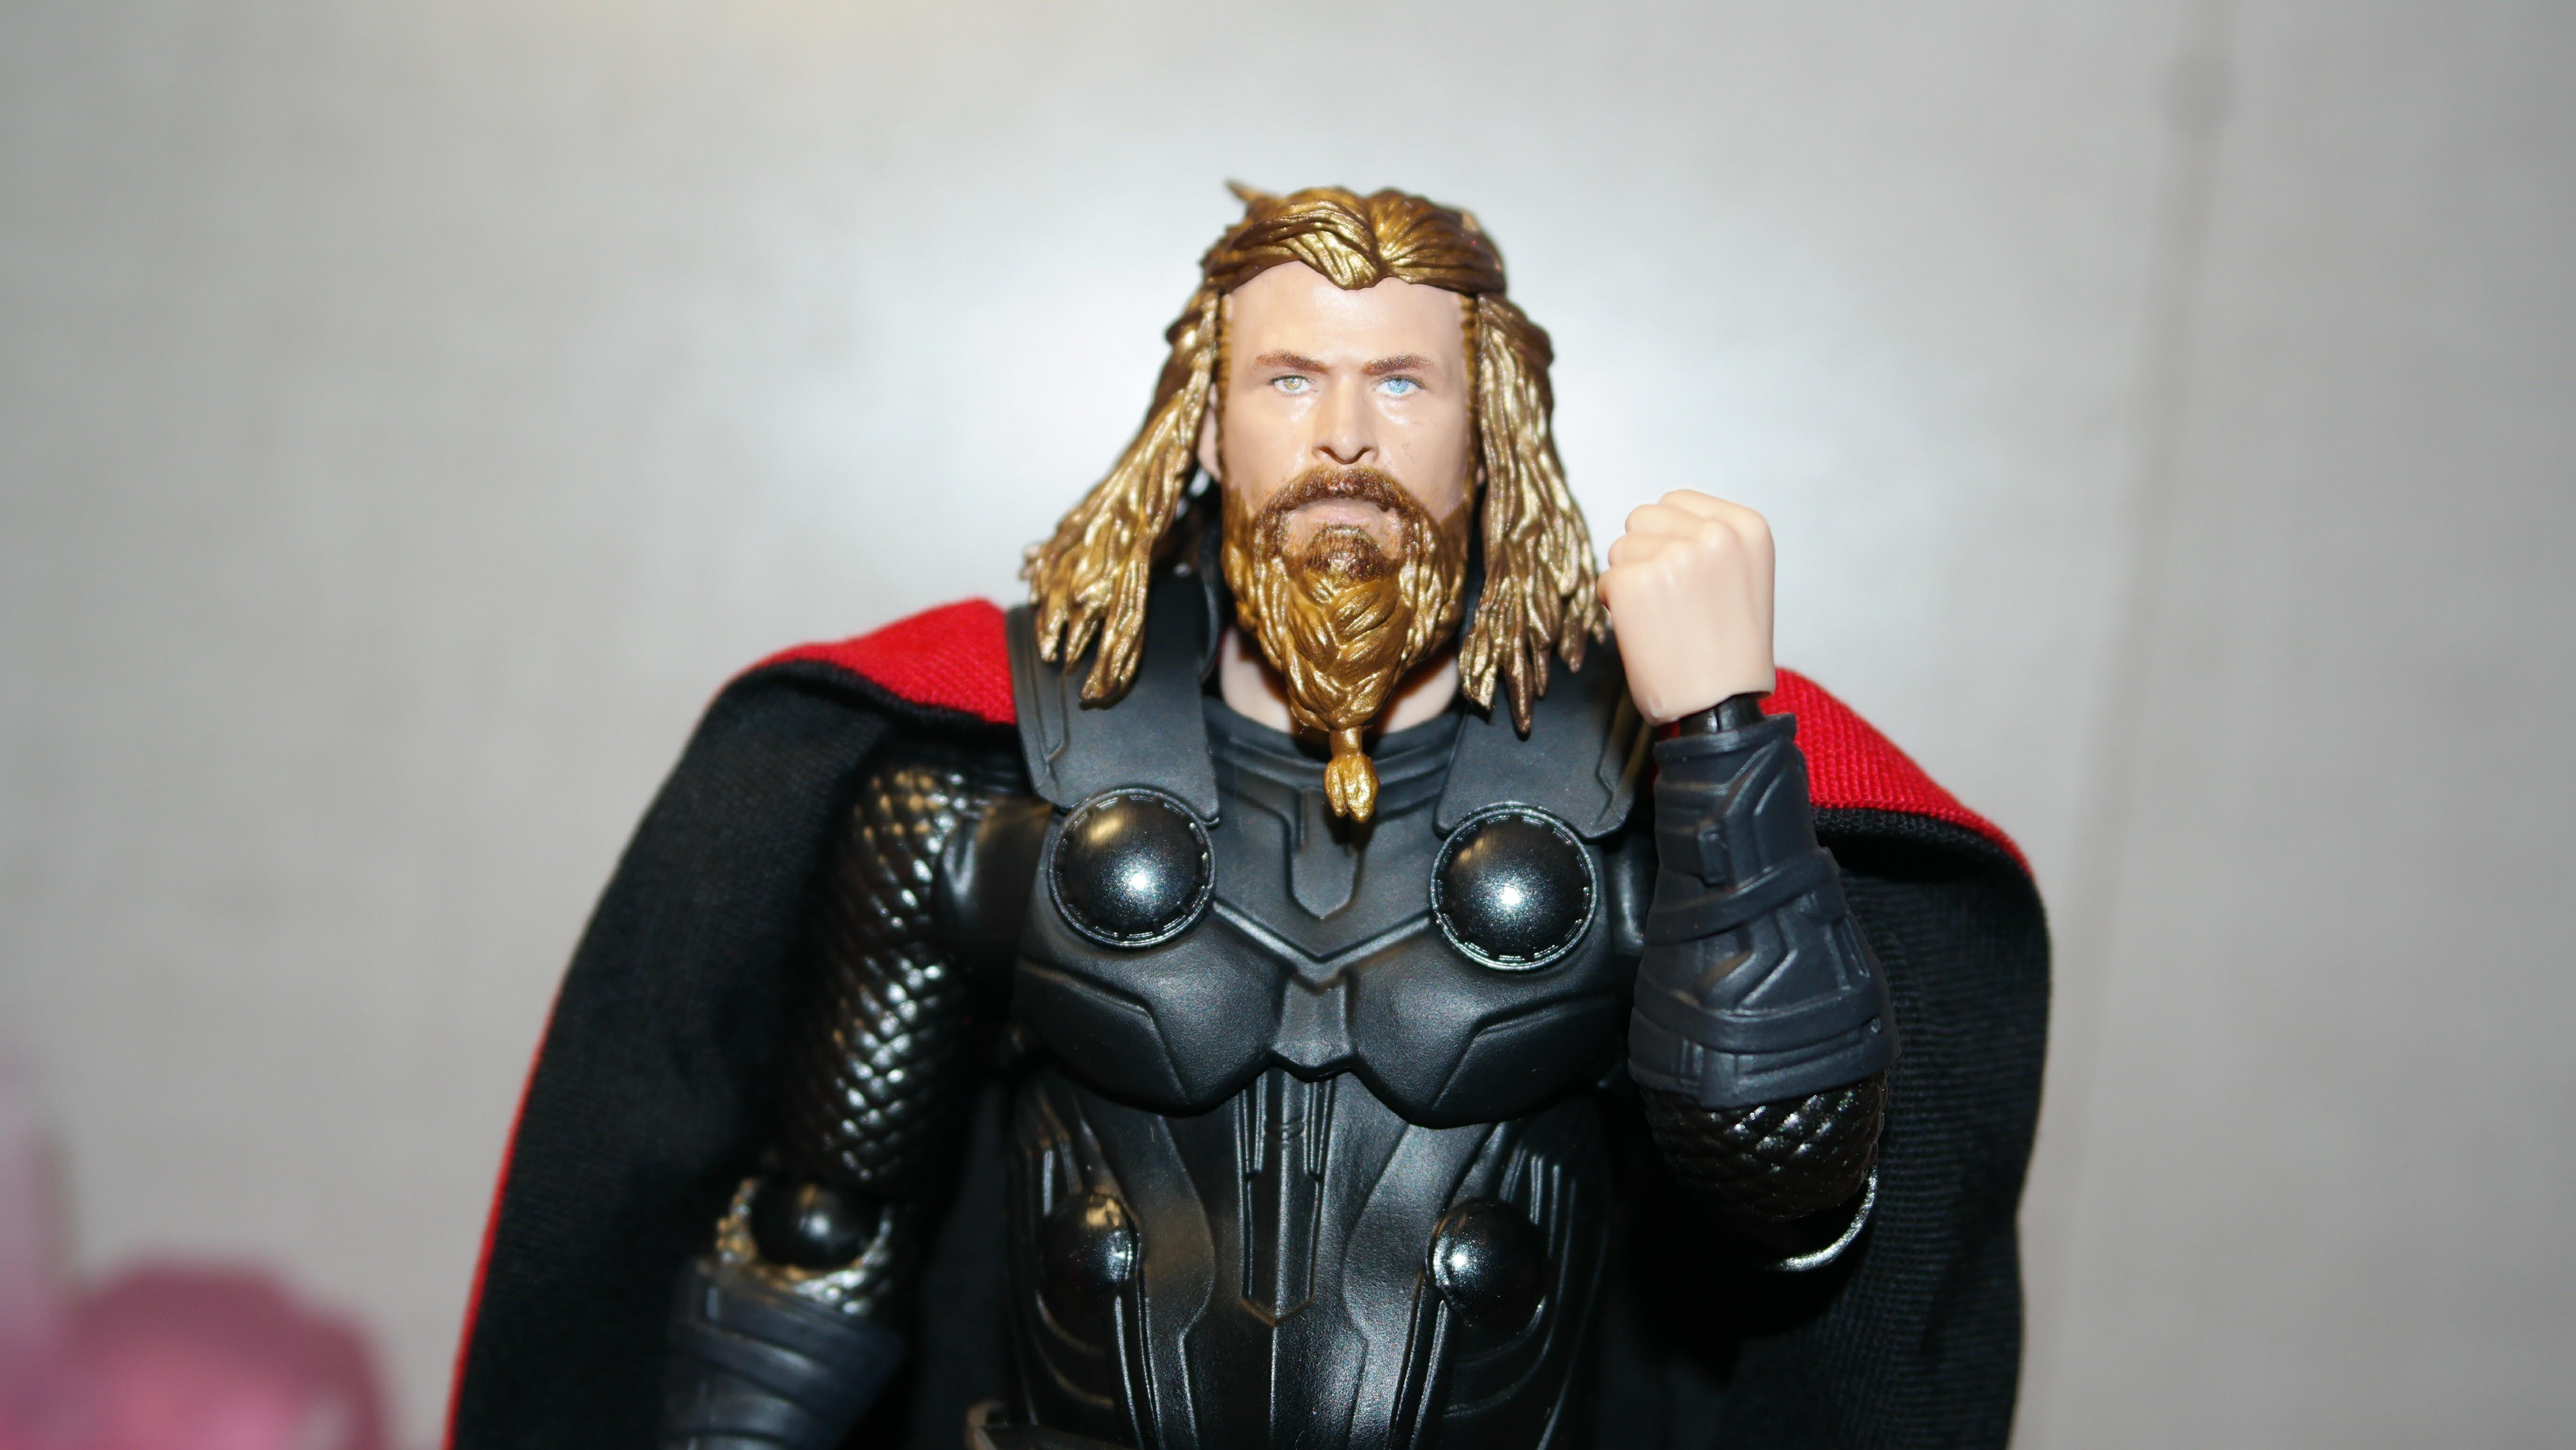 Figuarts Avengers Issue Thor Premium Tamashii Exclusive Figure Bandai S.H